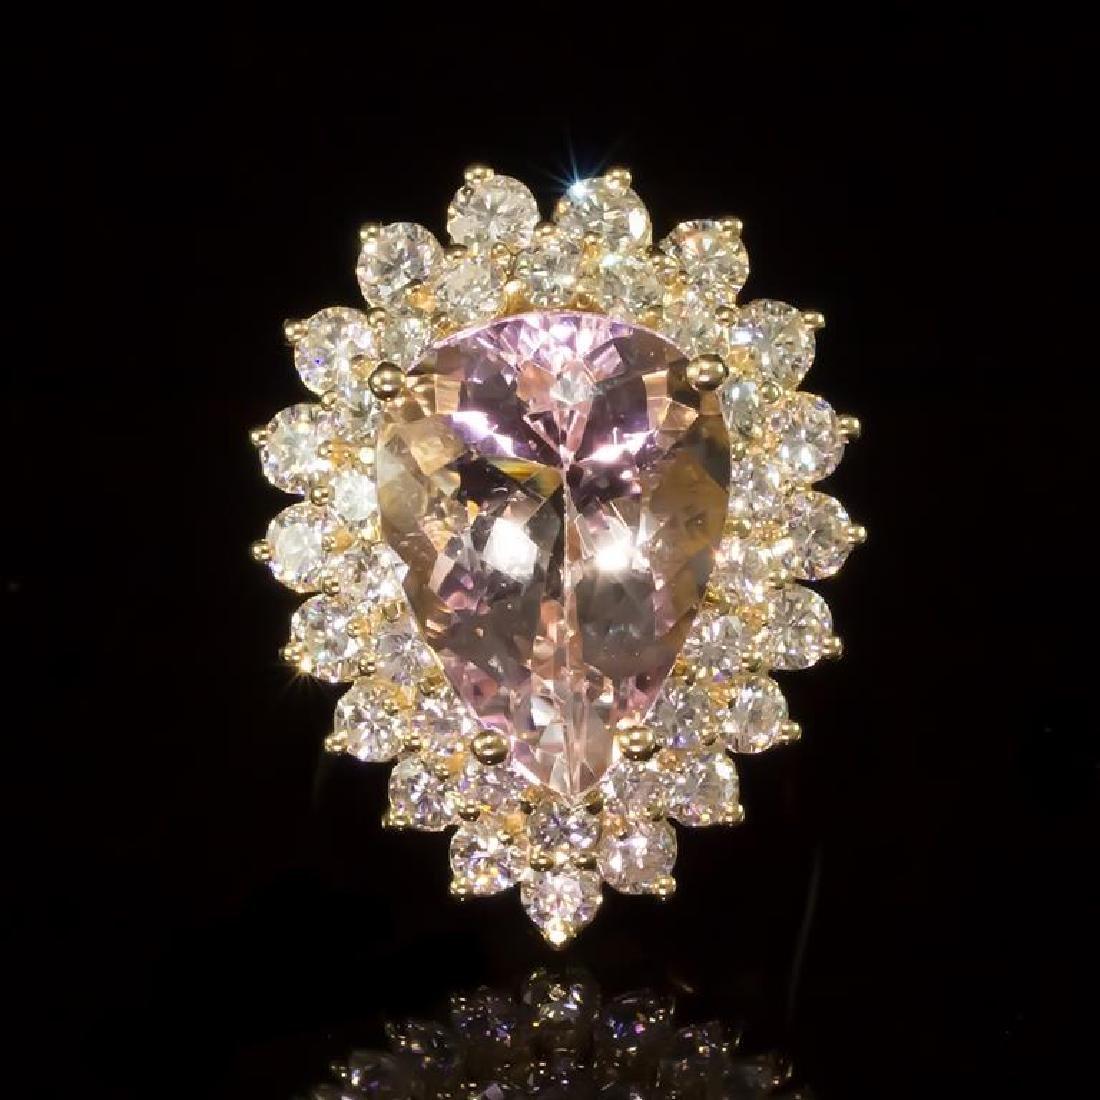 14K Gold 6.88ct Morganite 2.67ct Diamond Ring